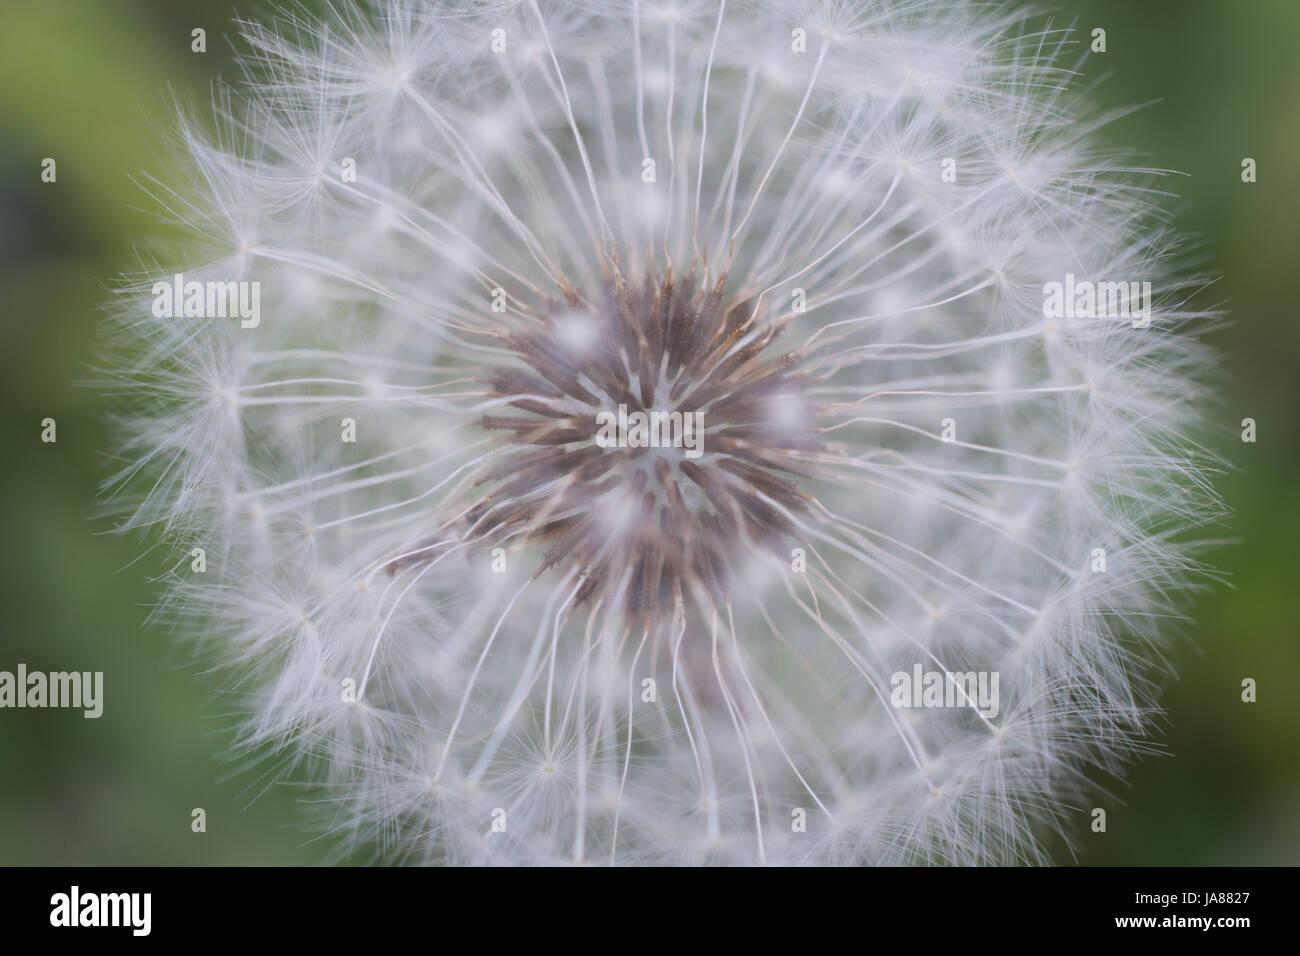 Dandelion Seed Head Up Close - Stock Image